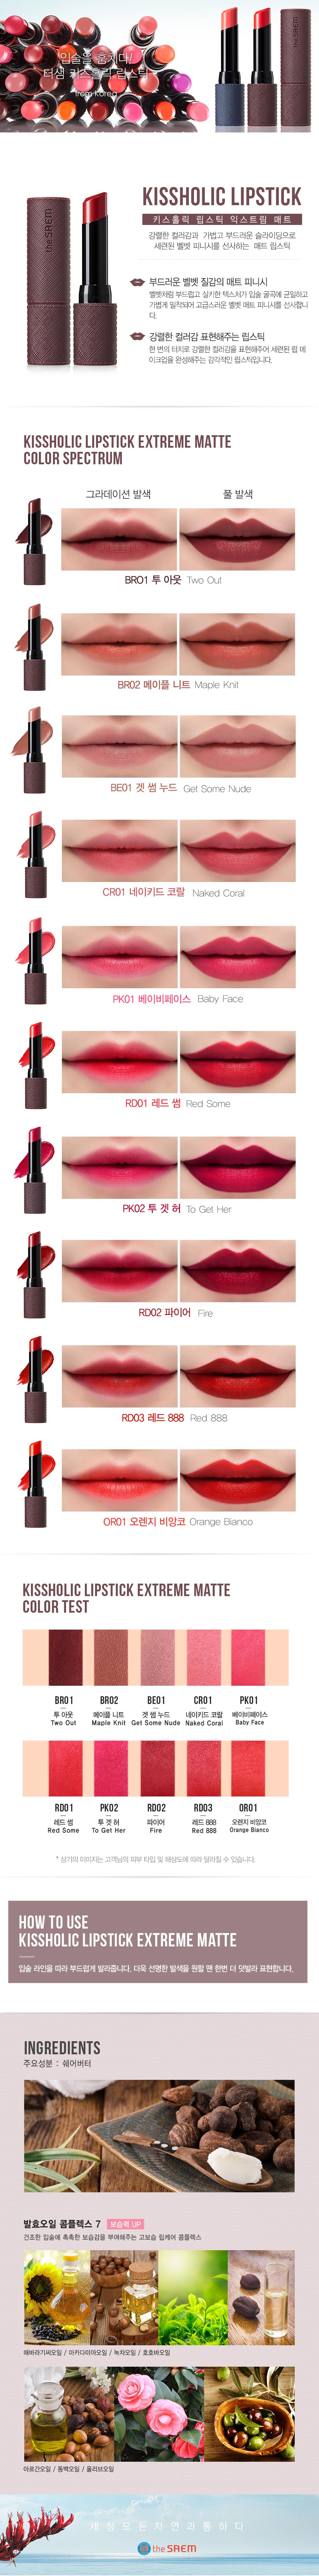 The Saem Kissholic Lipstick Extreme Matte 38g Korea Best Ebay How To Use